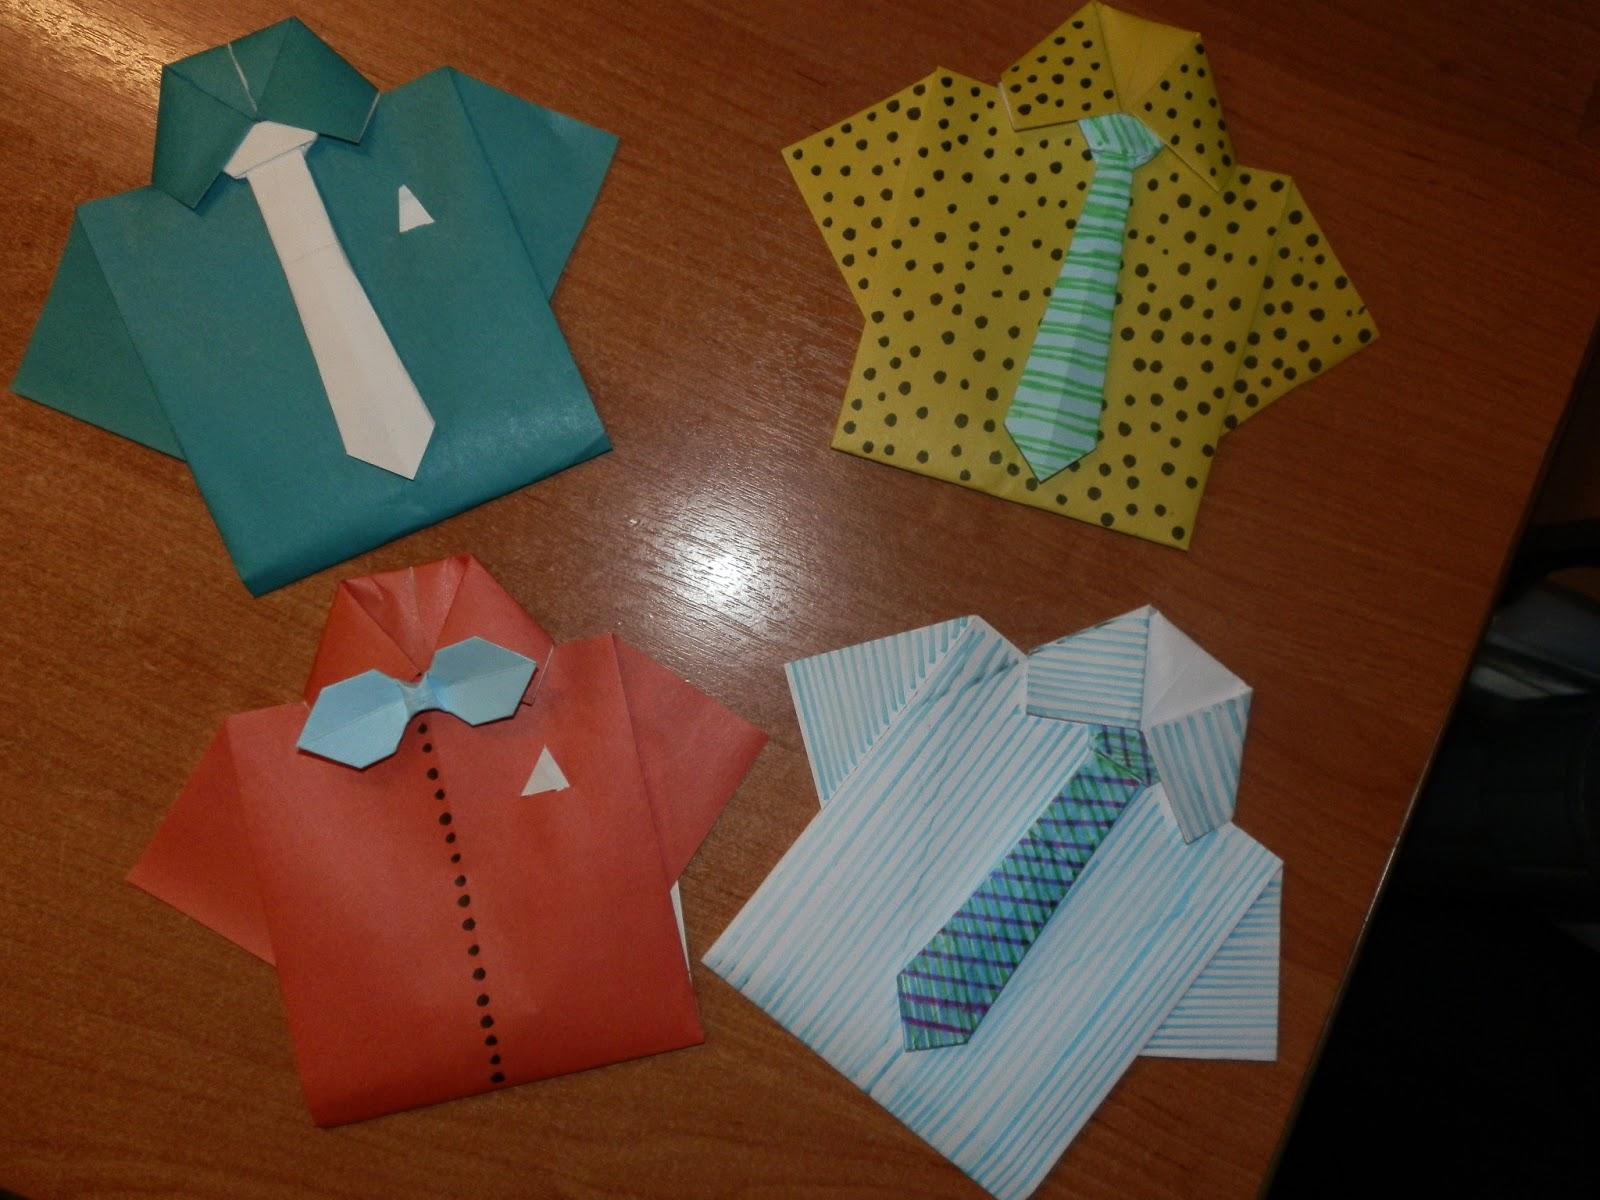 Коробка своими руками в виде рубашки с галстуком своими руками фото 156